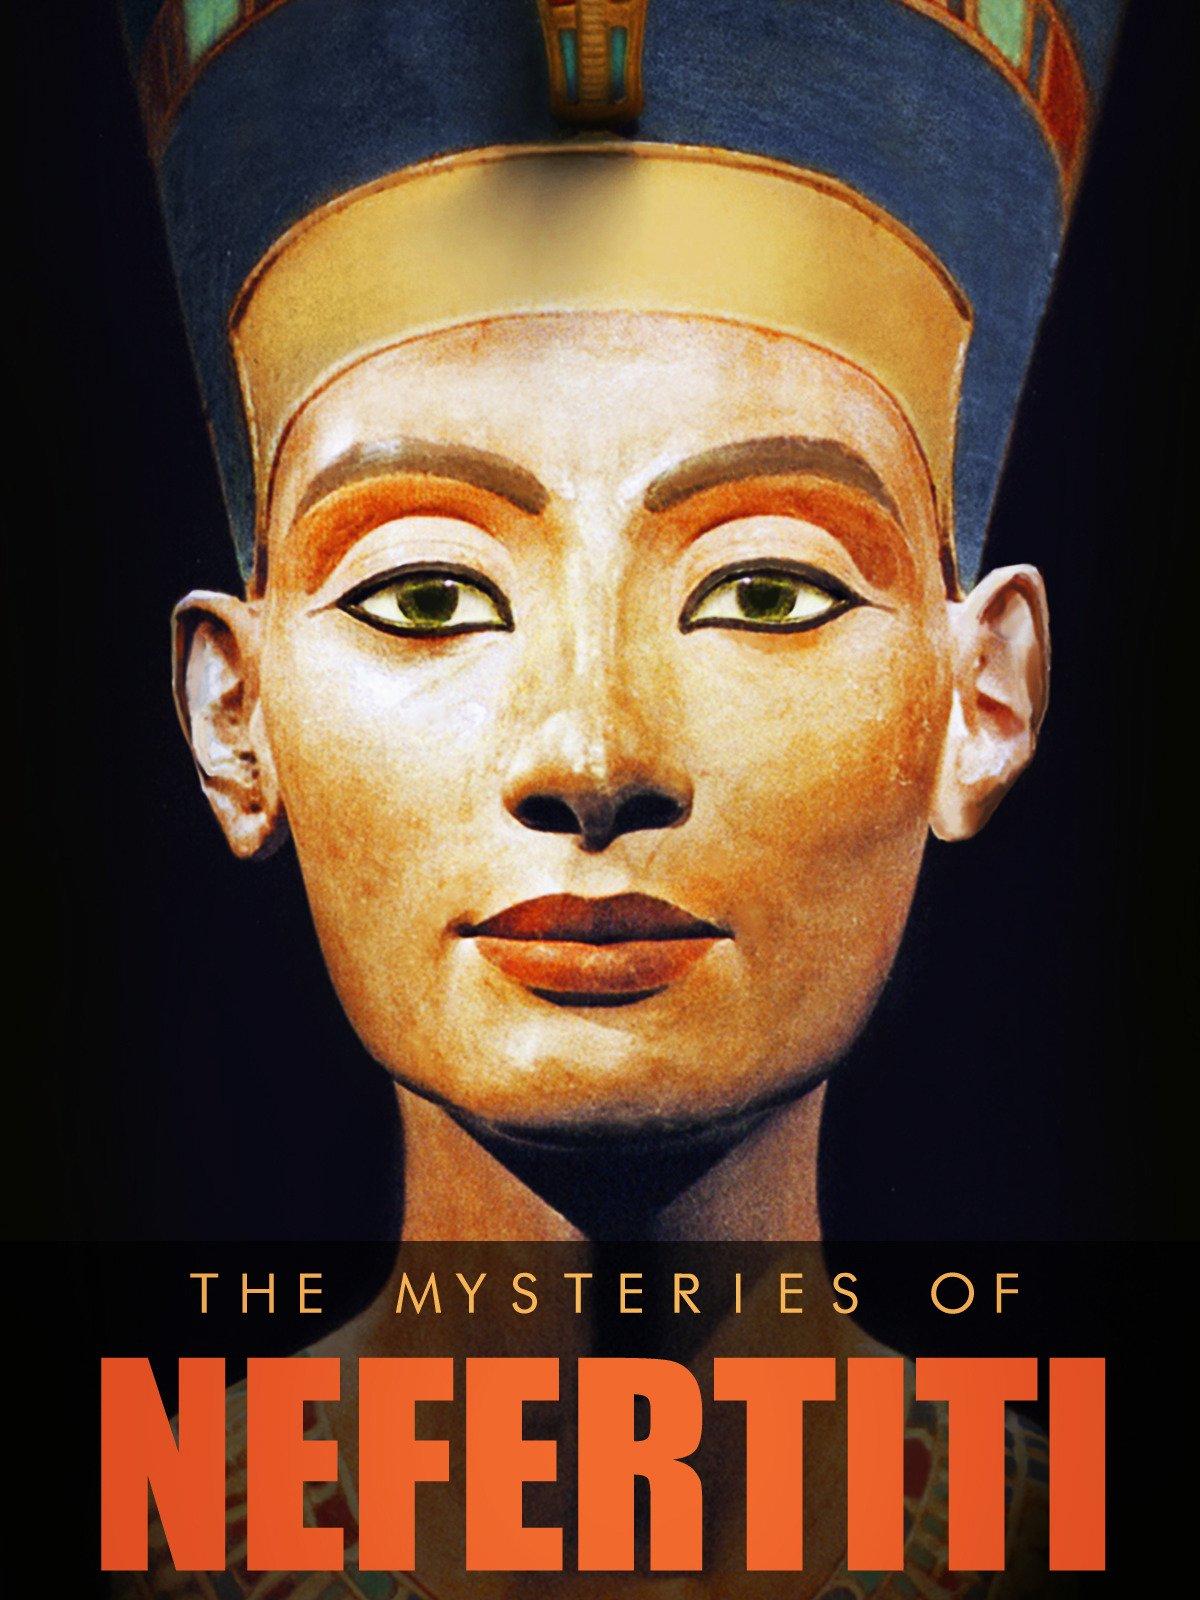 Watch The Mysteries of Nefertiti | Prime Video